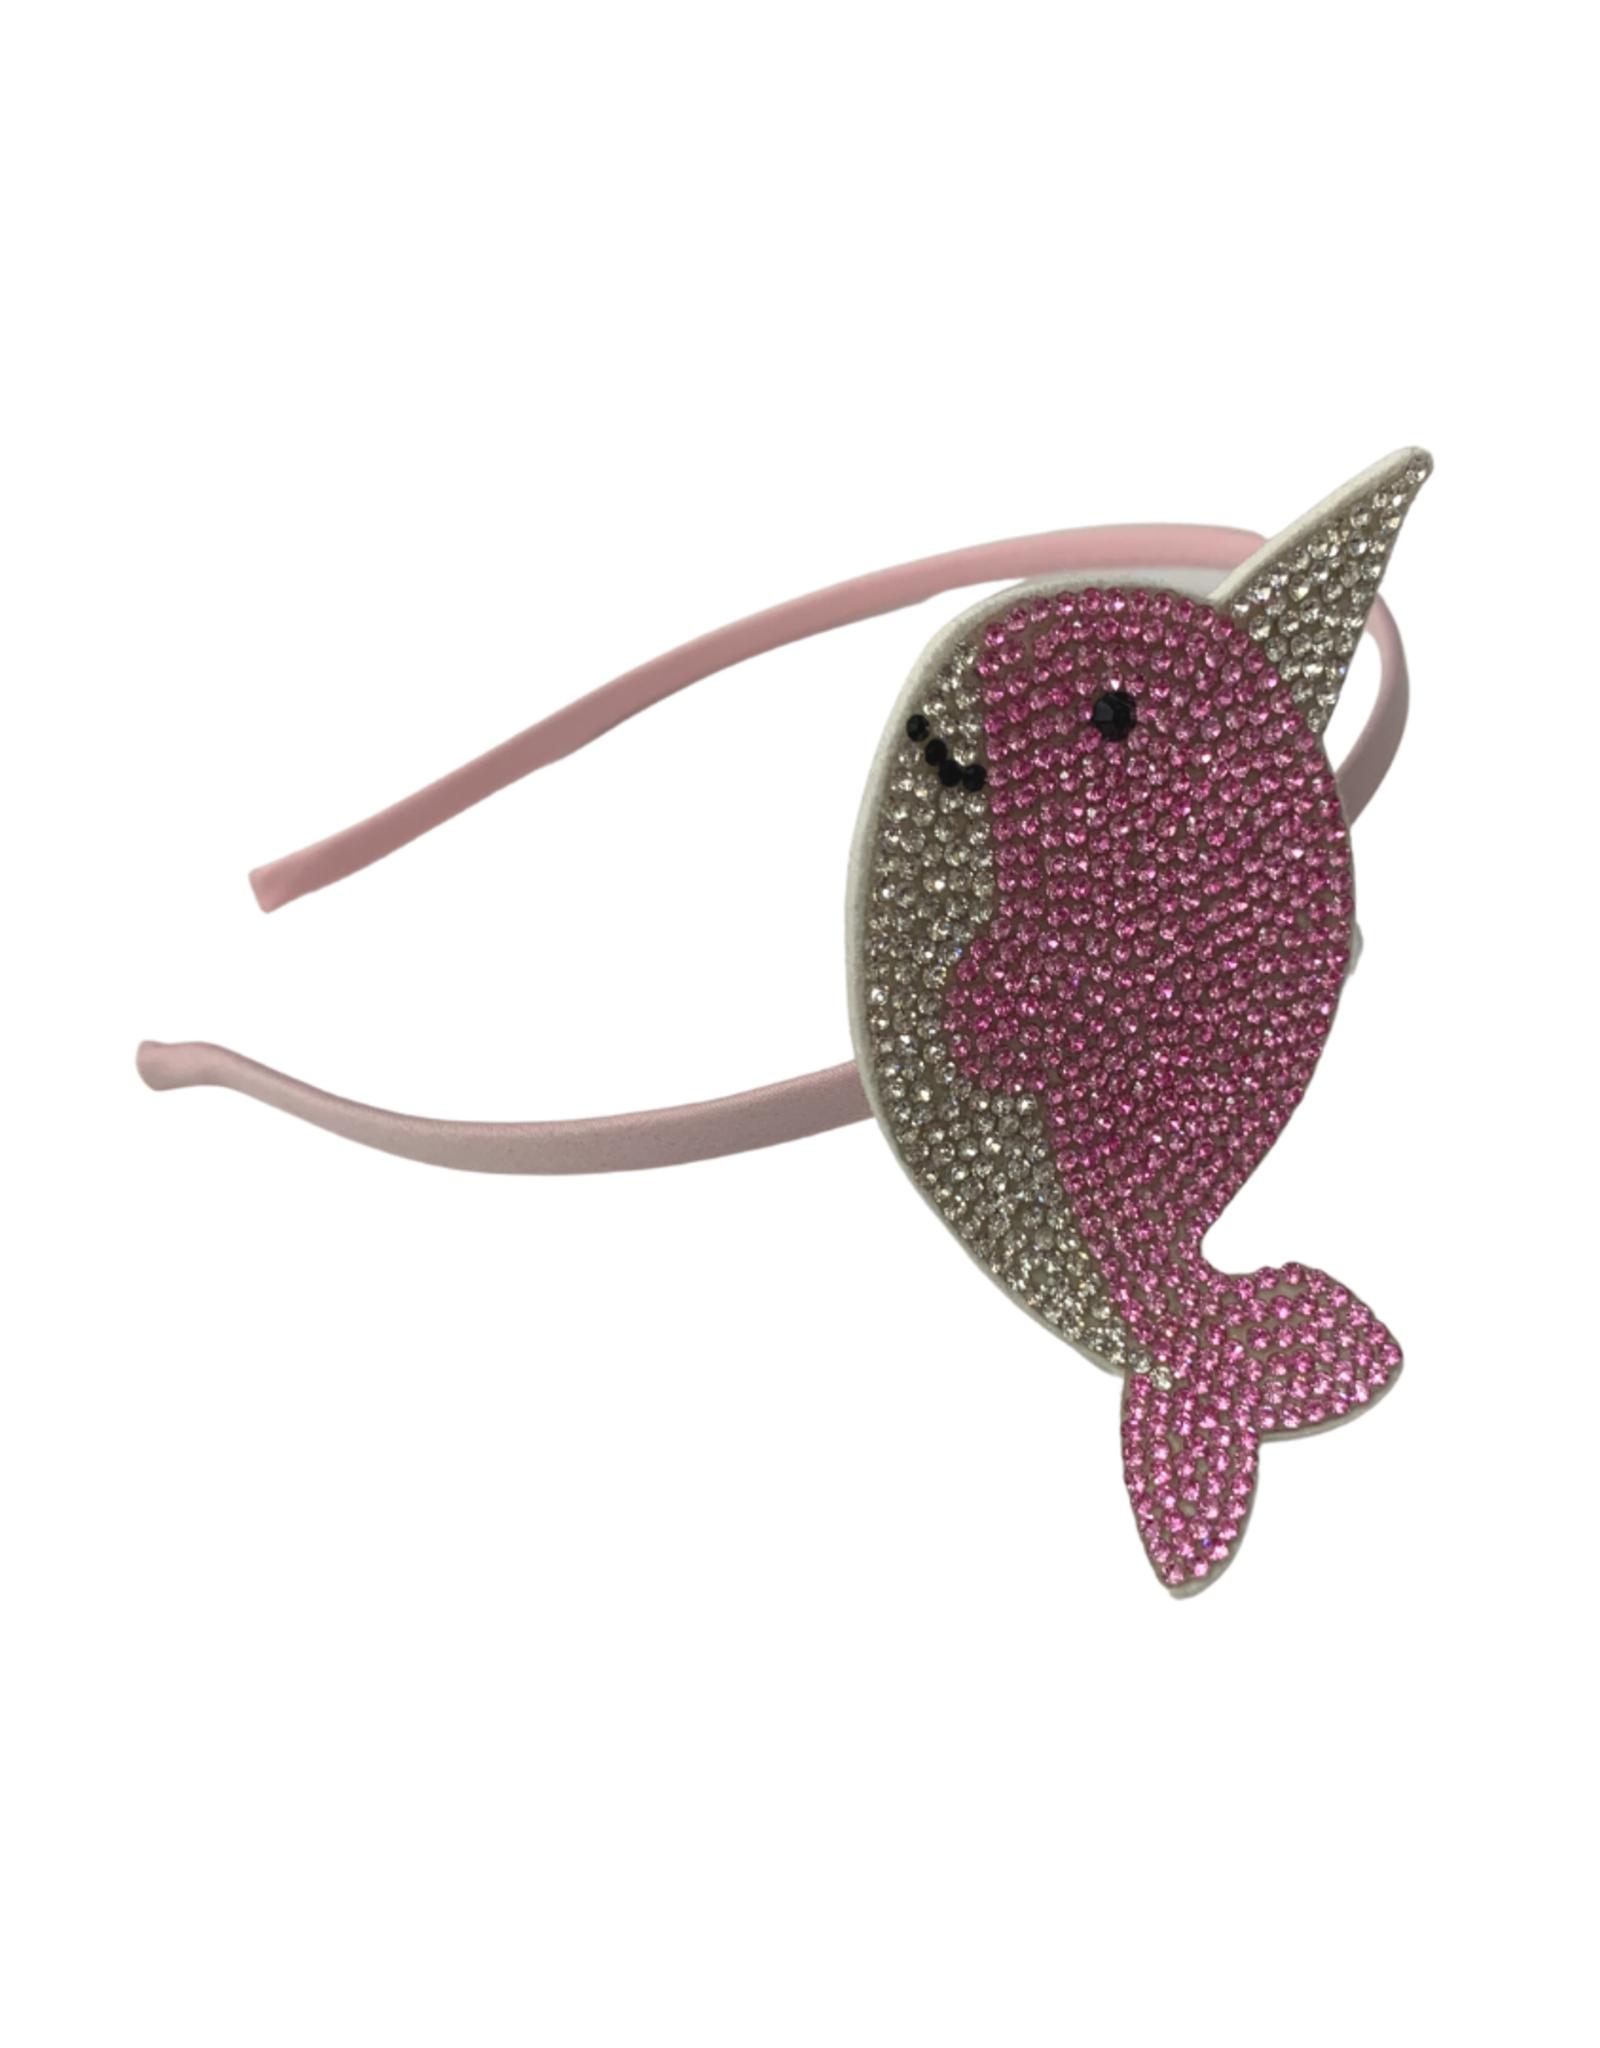 Bows Arts Rhinestone Motif Headband - Narwhal